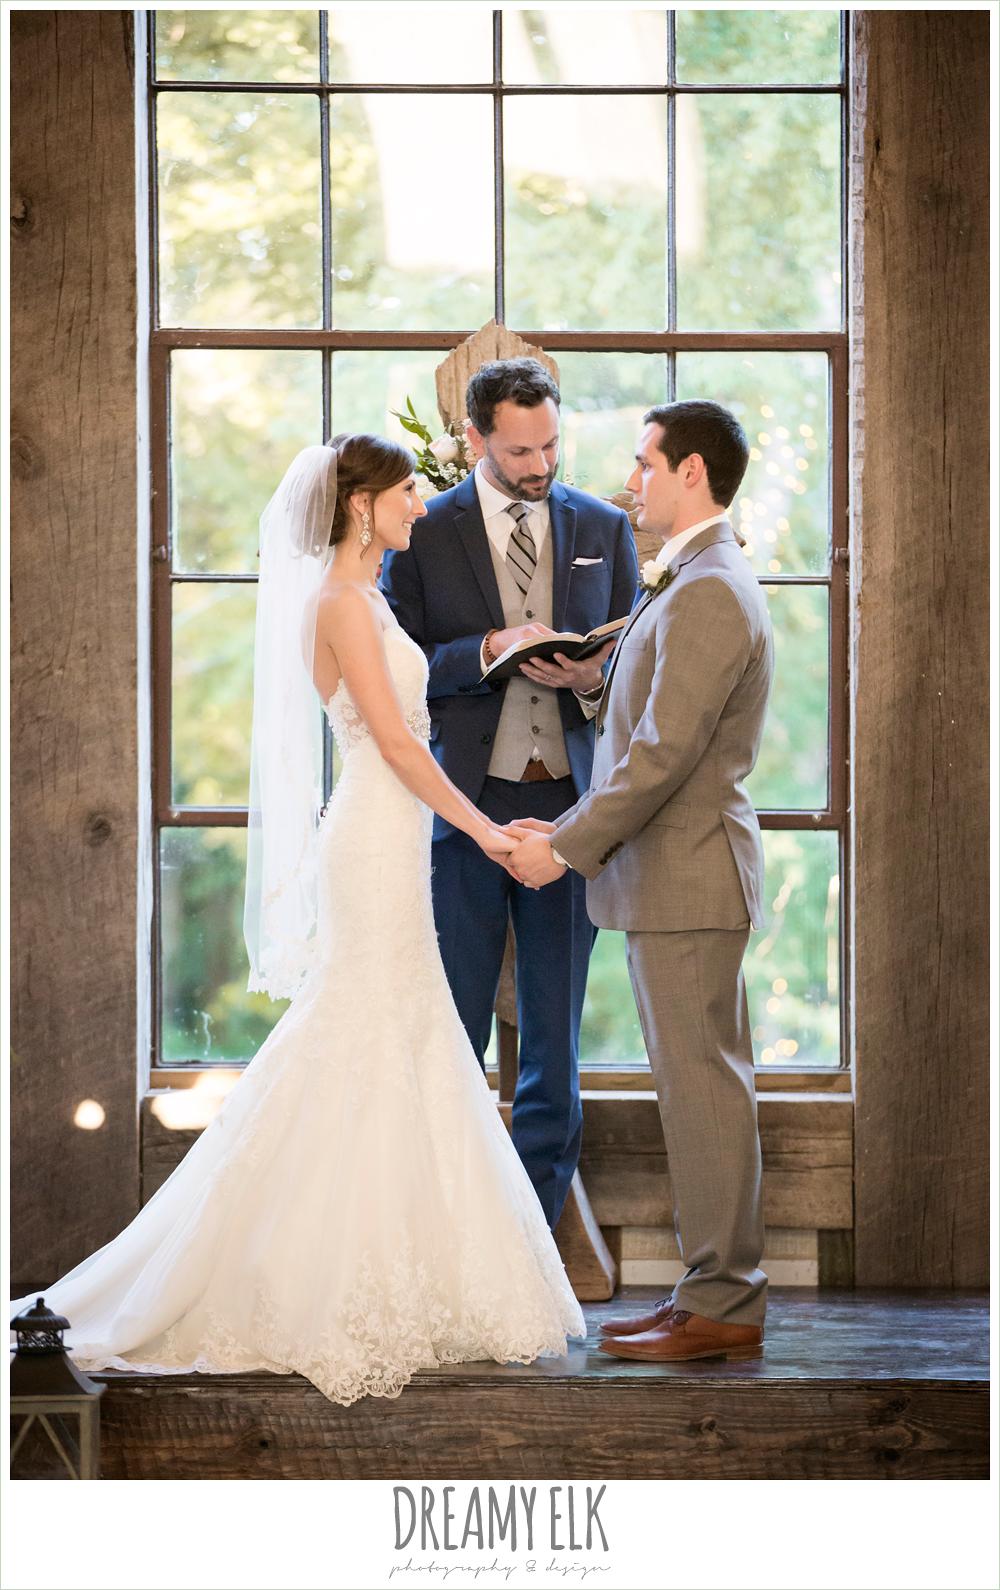 lace mermaid wedding dress, wedding ceremony, rustic chic, spring wedding photo, big sky barn, montgomery, texas {dreamy elk photography and design}